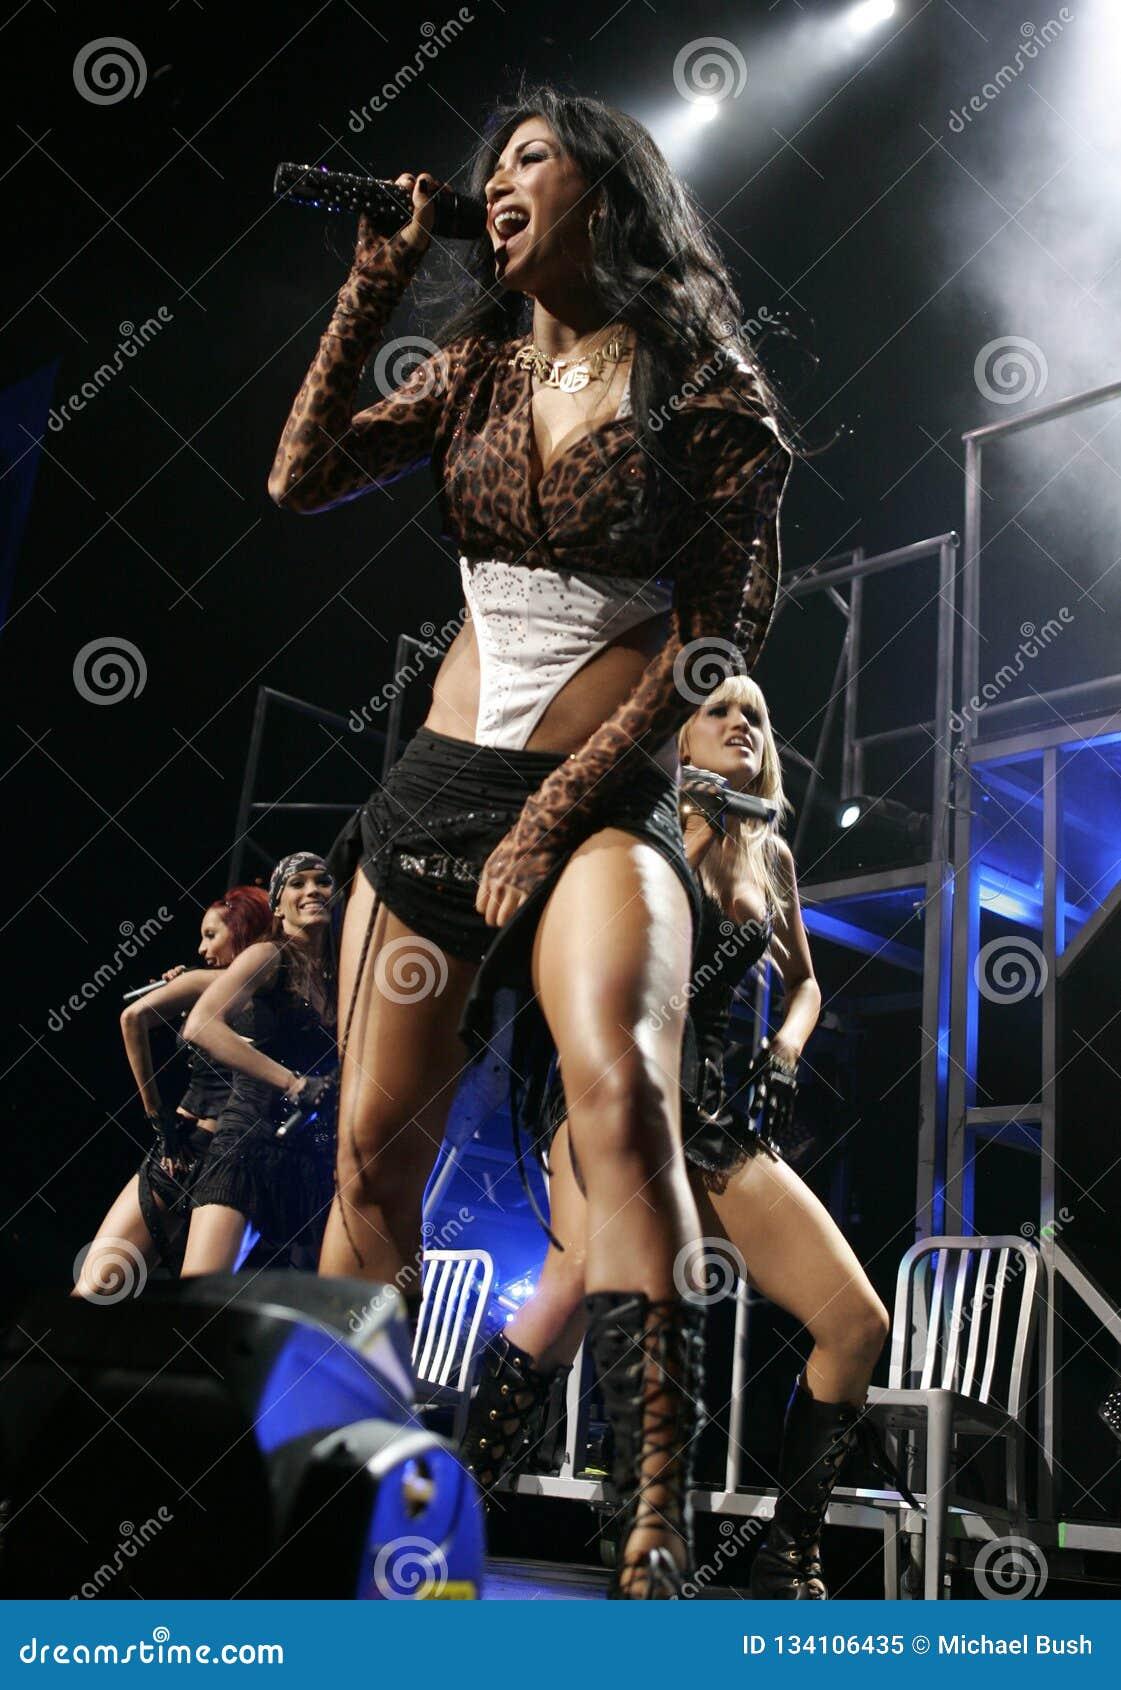 Pussycat Dolls Perform in Concert